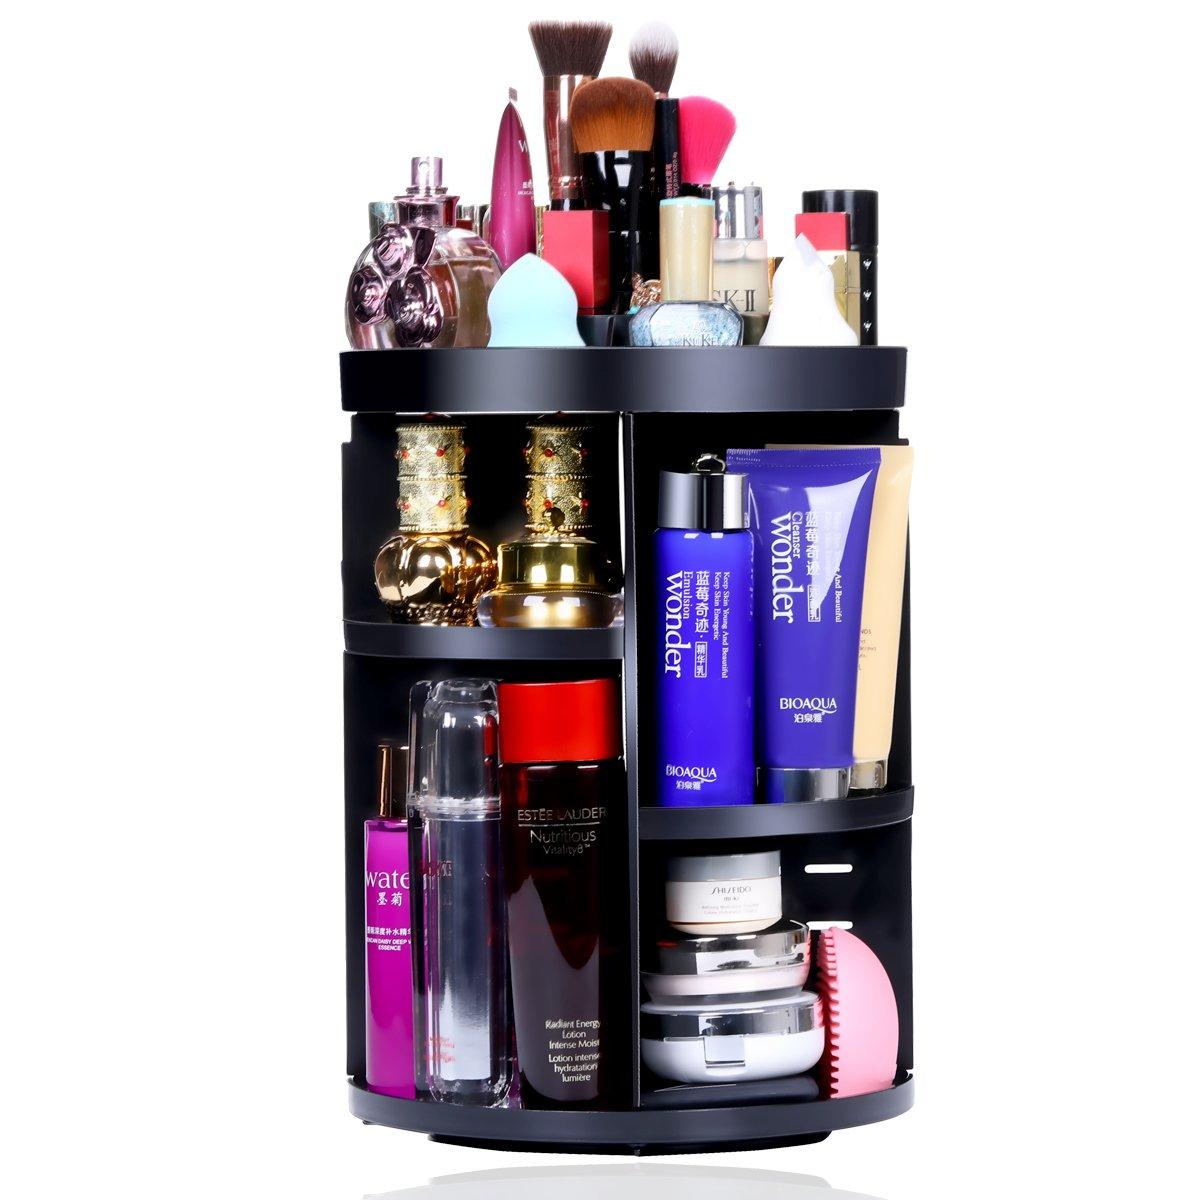 Aspior Bathroom Organizer 360 Rotating Cosmetic Storage Holders for Modern Vanity Countertop Makeup Accessories Display Large Capacity 7 Layers Adjustable Round Black